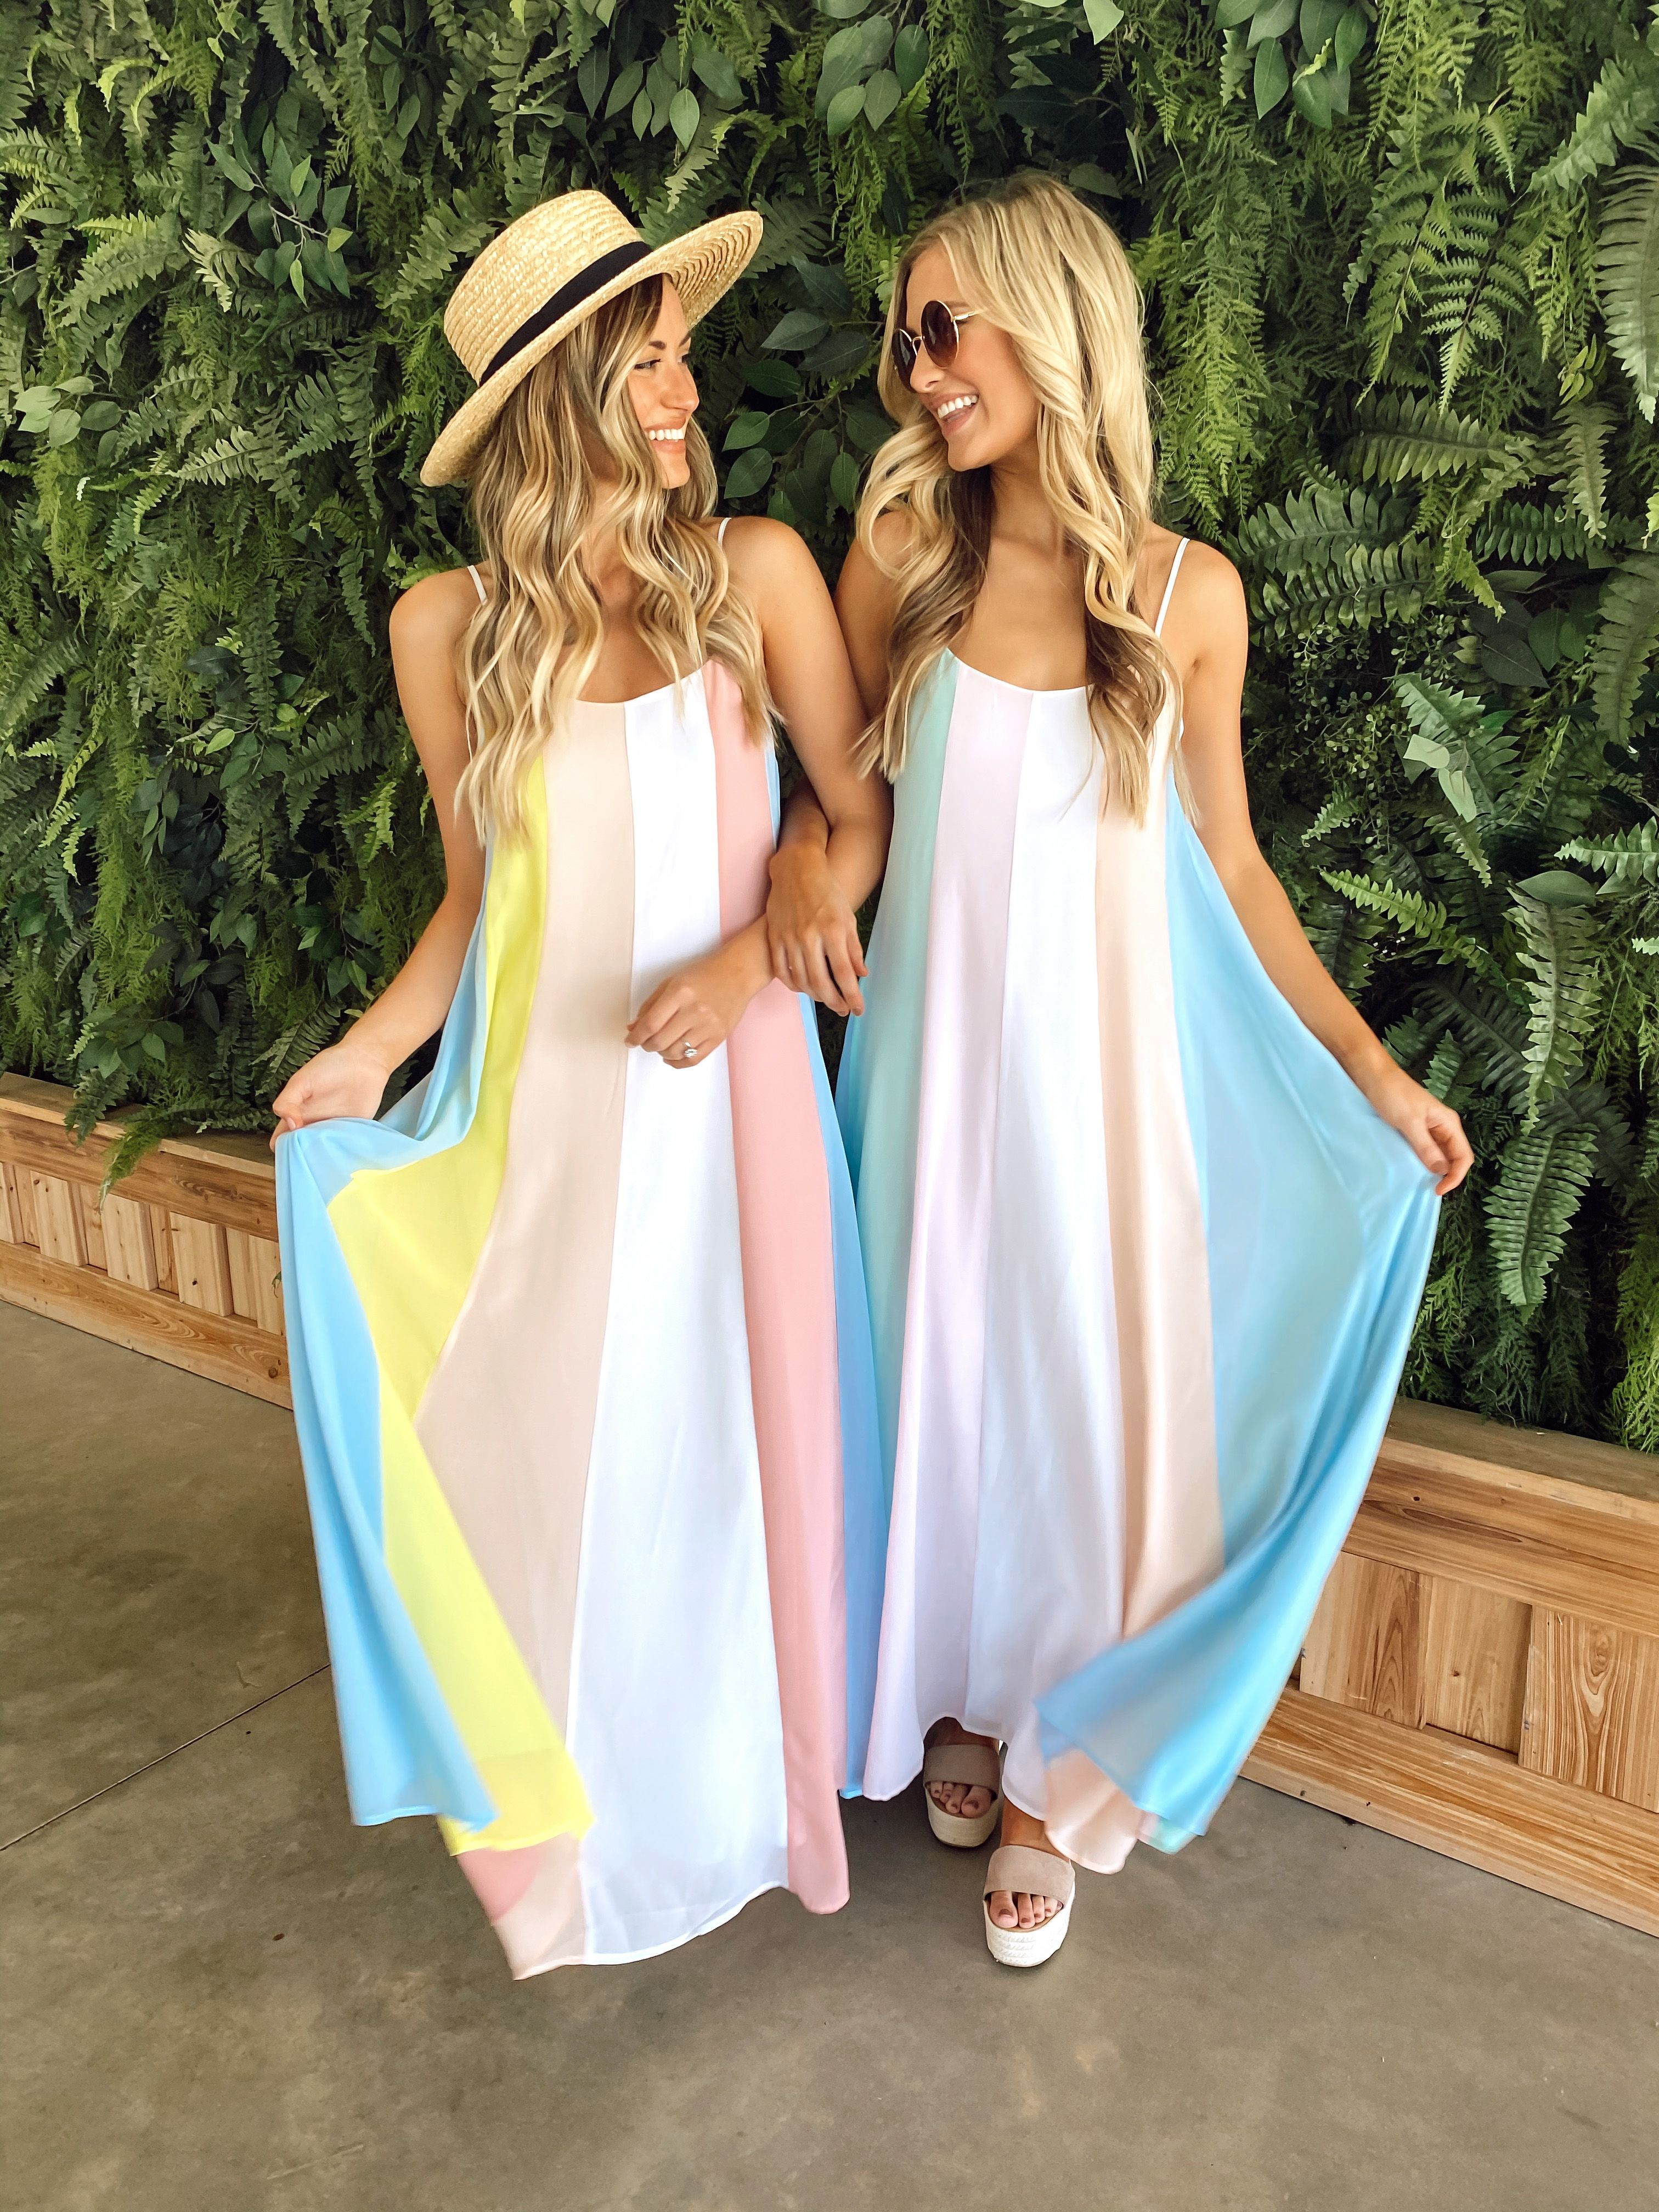 Beautiful And Bright Maxi Dresses In 2020 Cute Maxi Dress Bright Maxi Dress Striped Maxi Dresses